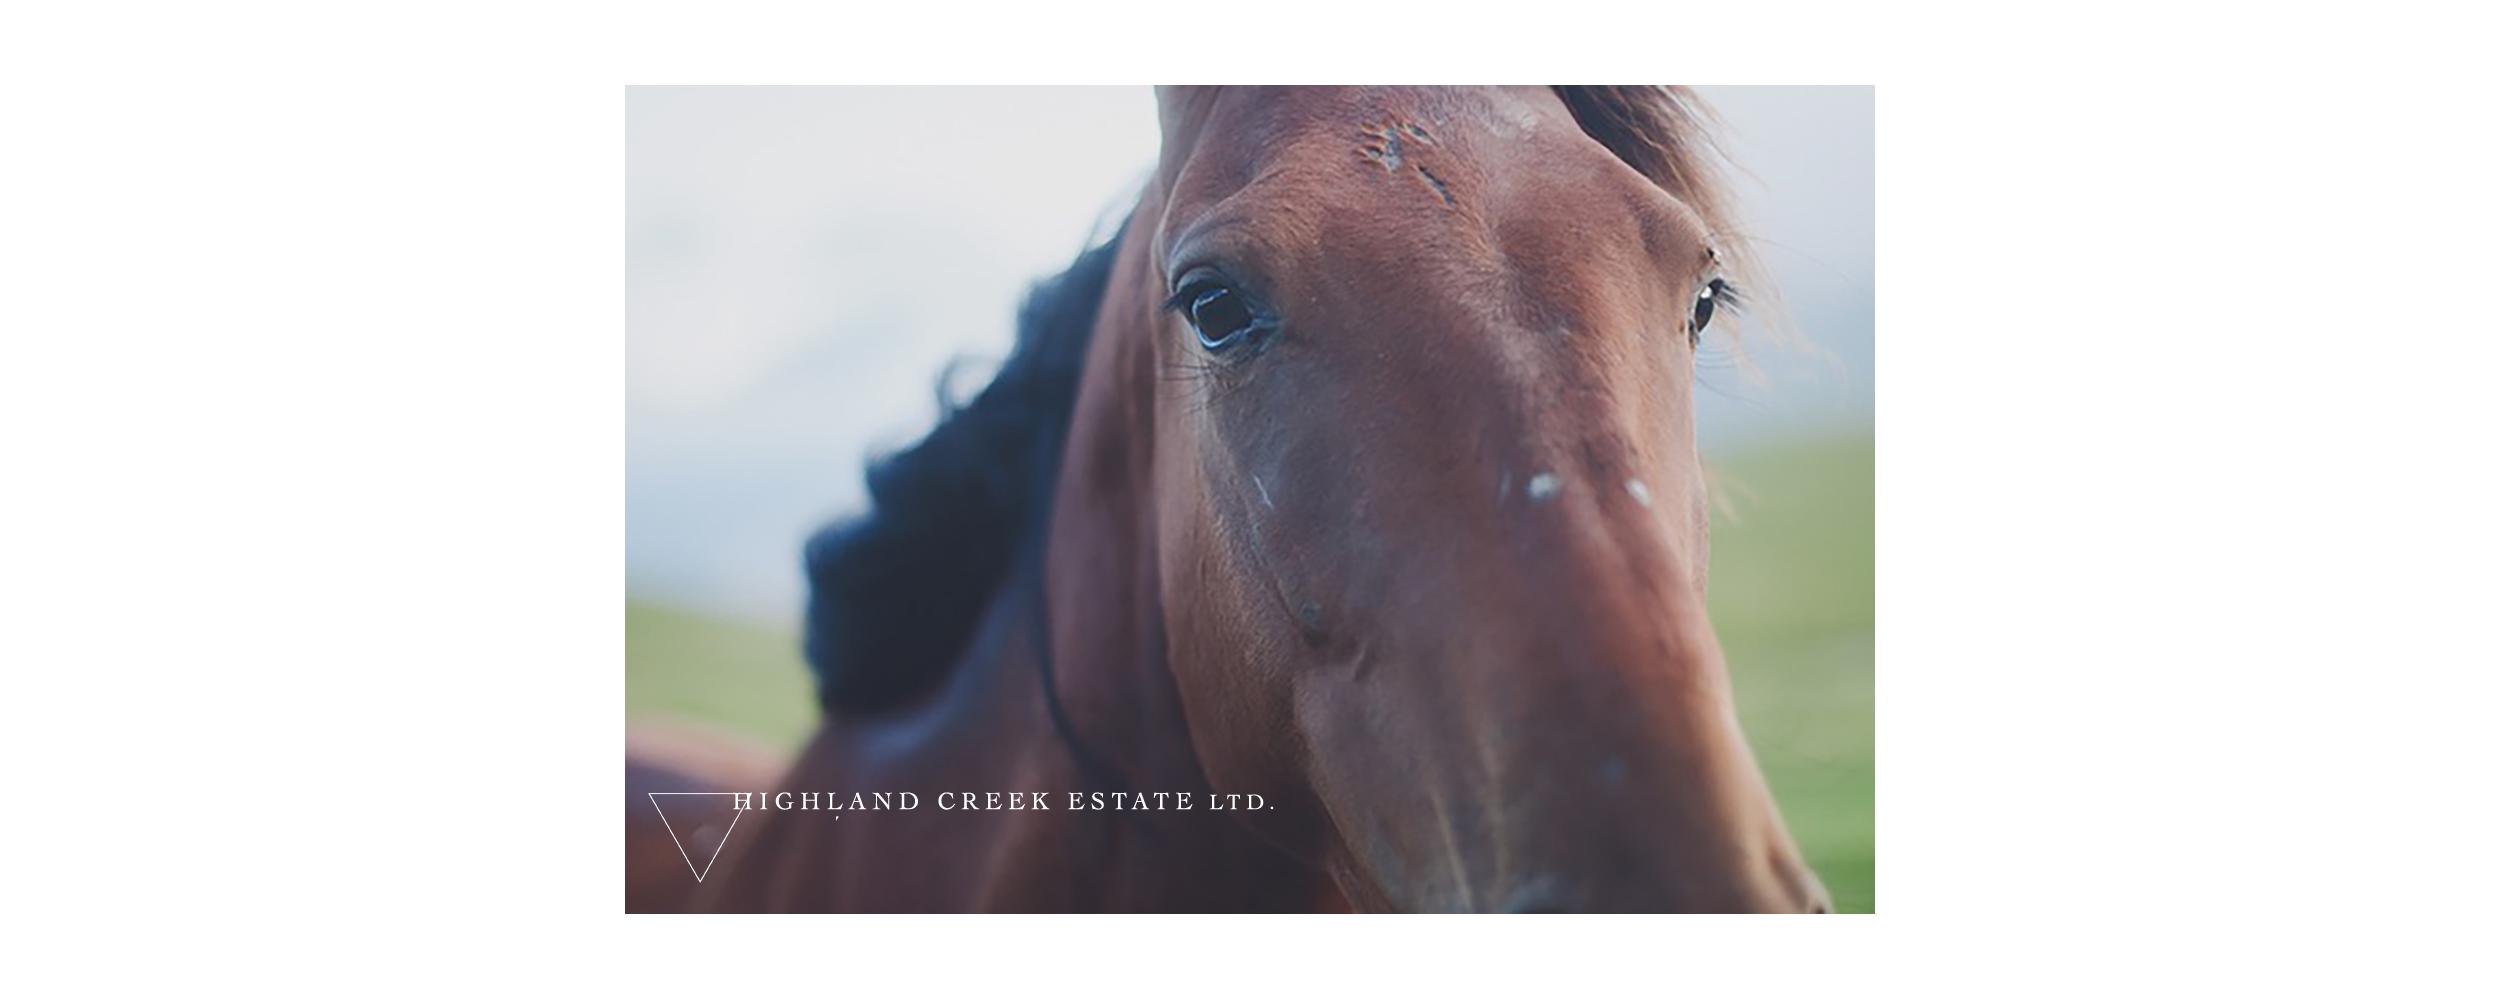 HIGHLAND CREEK ESTATE Equestrian.png